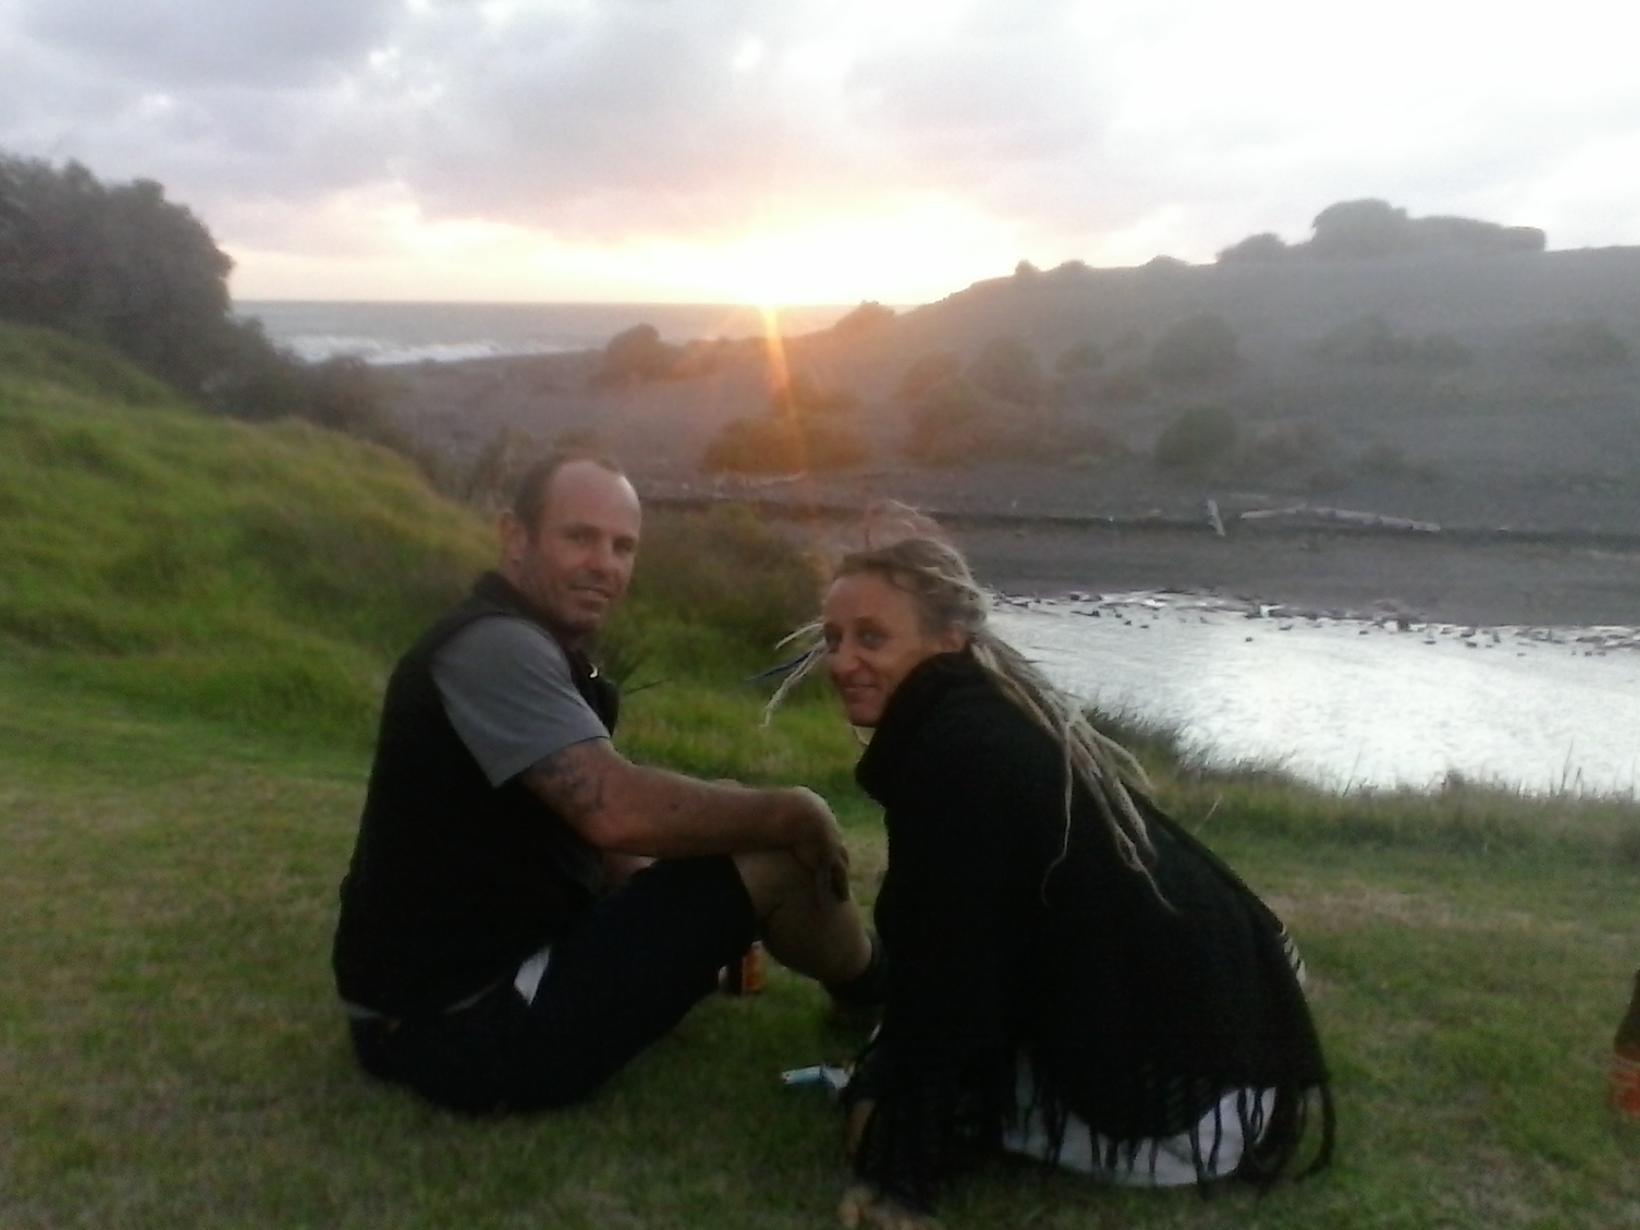 Karen & George from Melbourne, Victoria, Australia